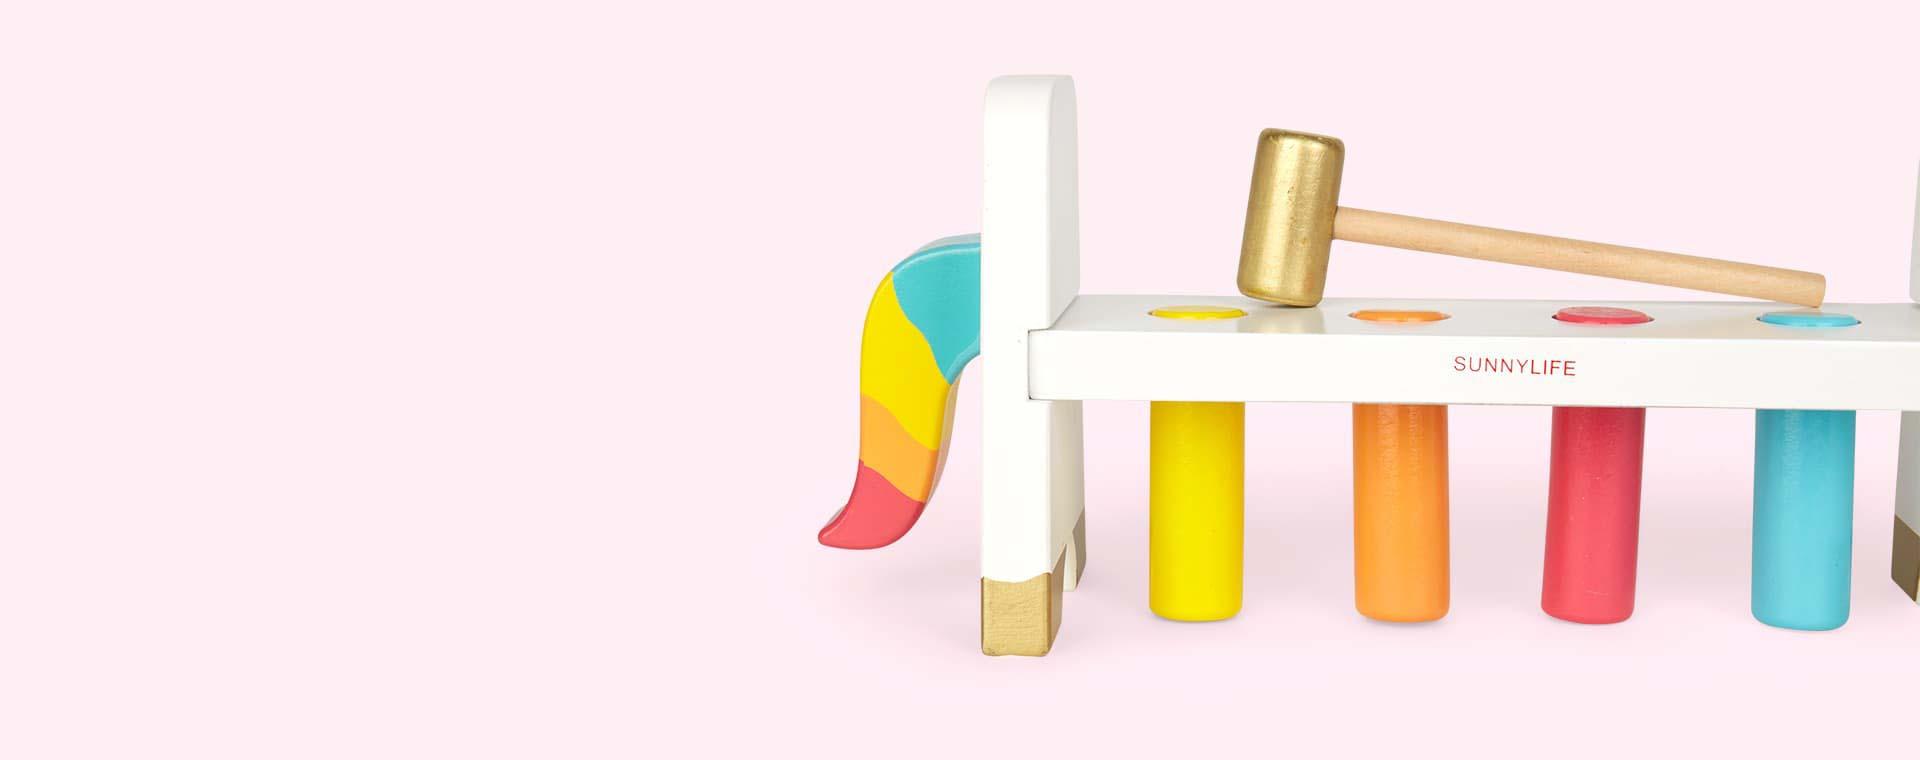 Multi Sunnylife Unicorn Hammer Bench